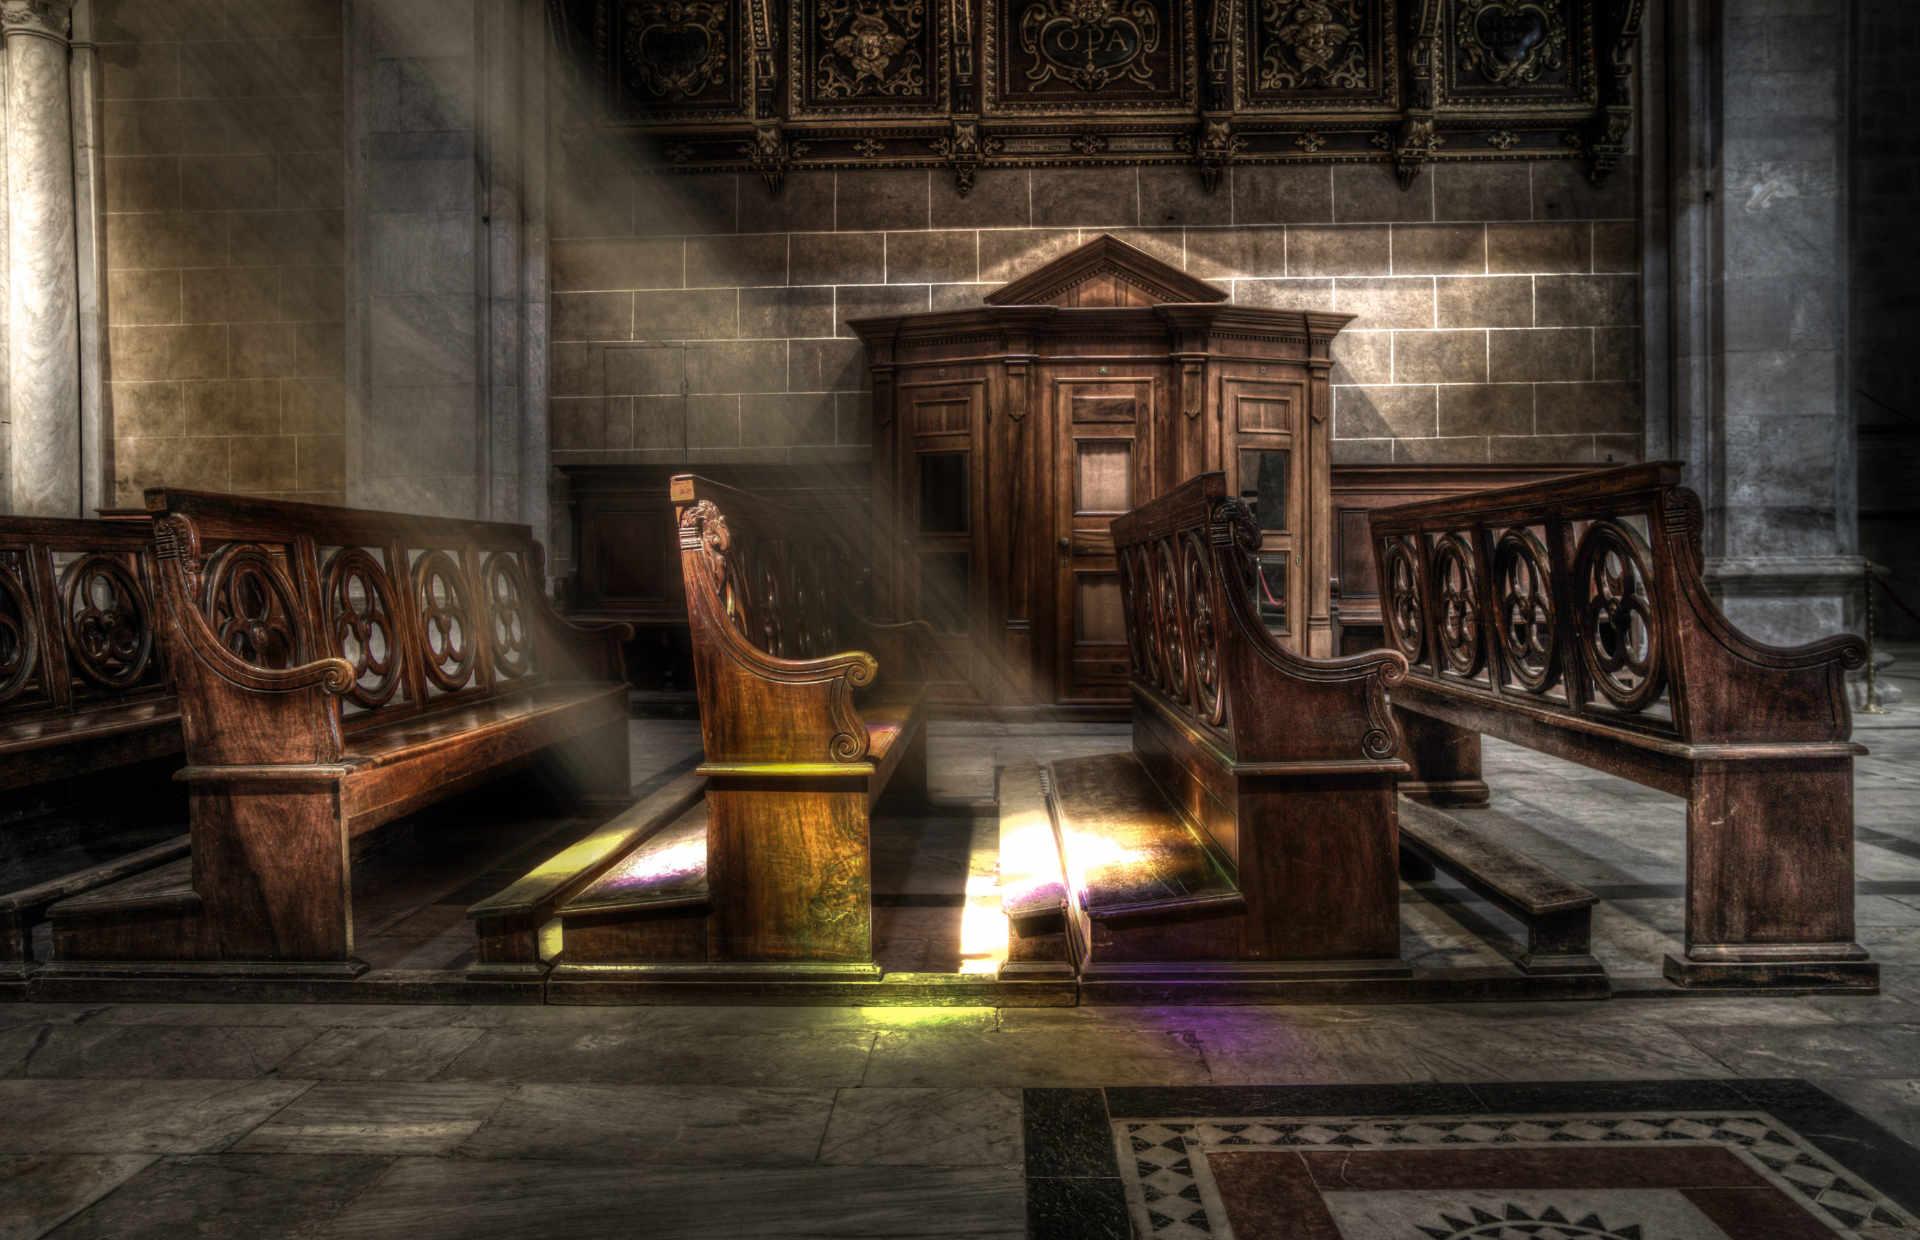 Mega-Church Pastor: The Ten Commandments No Longer Applicable, Un-hitch From the Old Testament